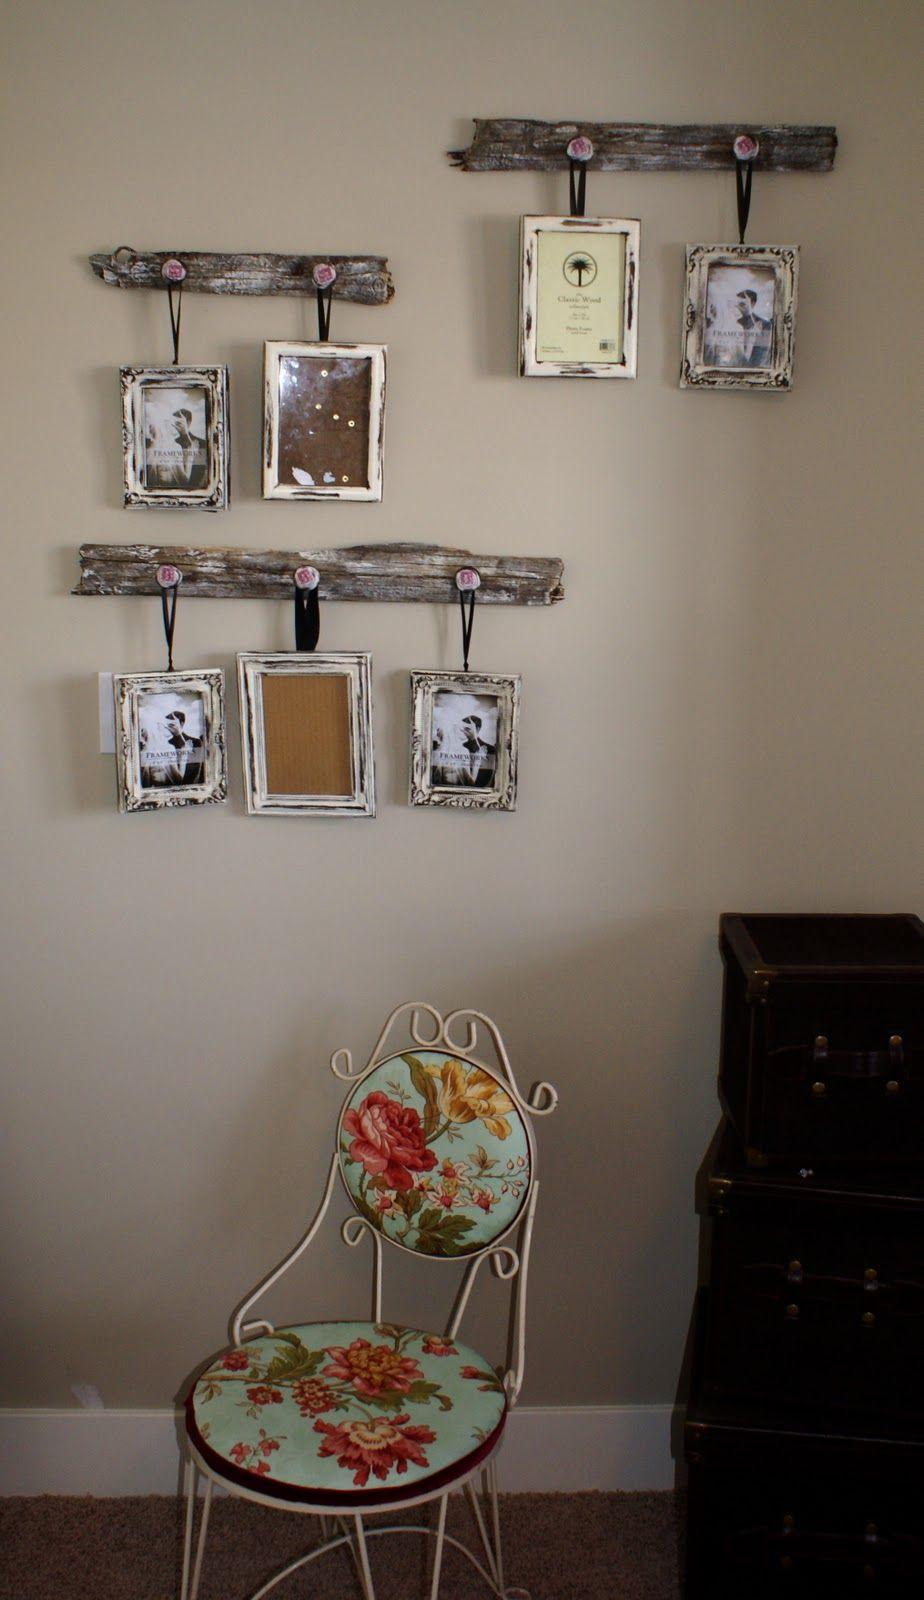 Ava Blake Creations: Reclaimed Barn Wood Creations   crafts ...